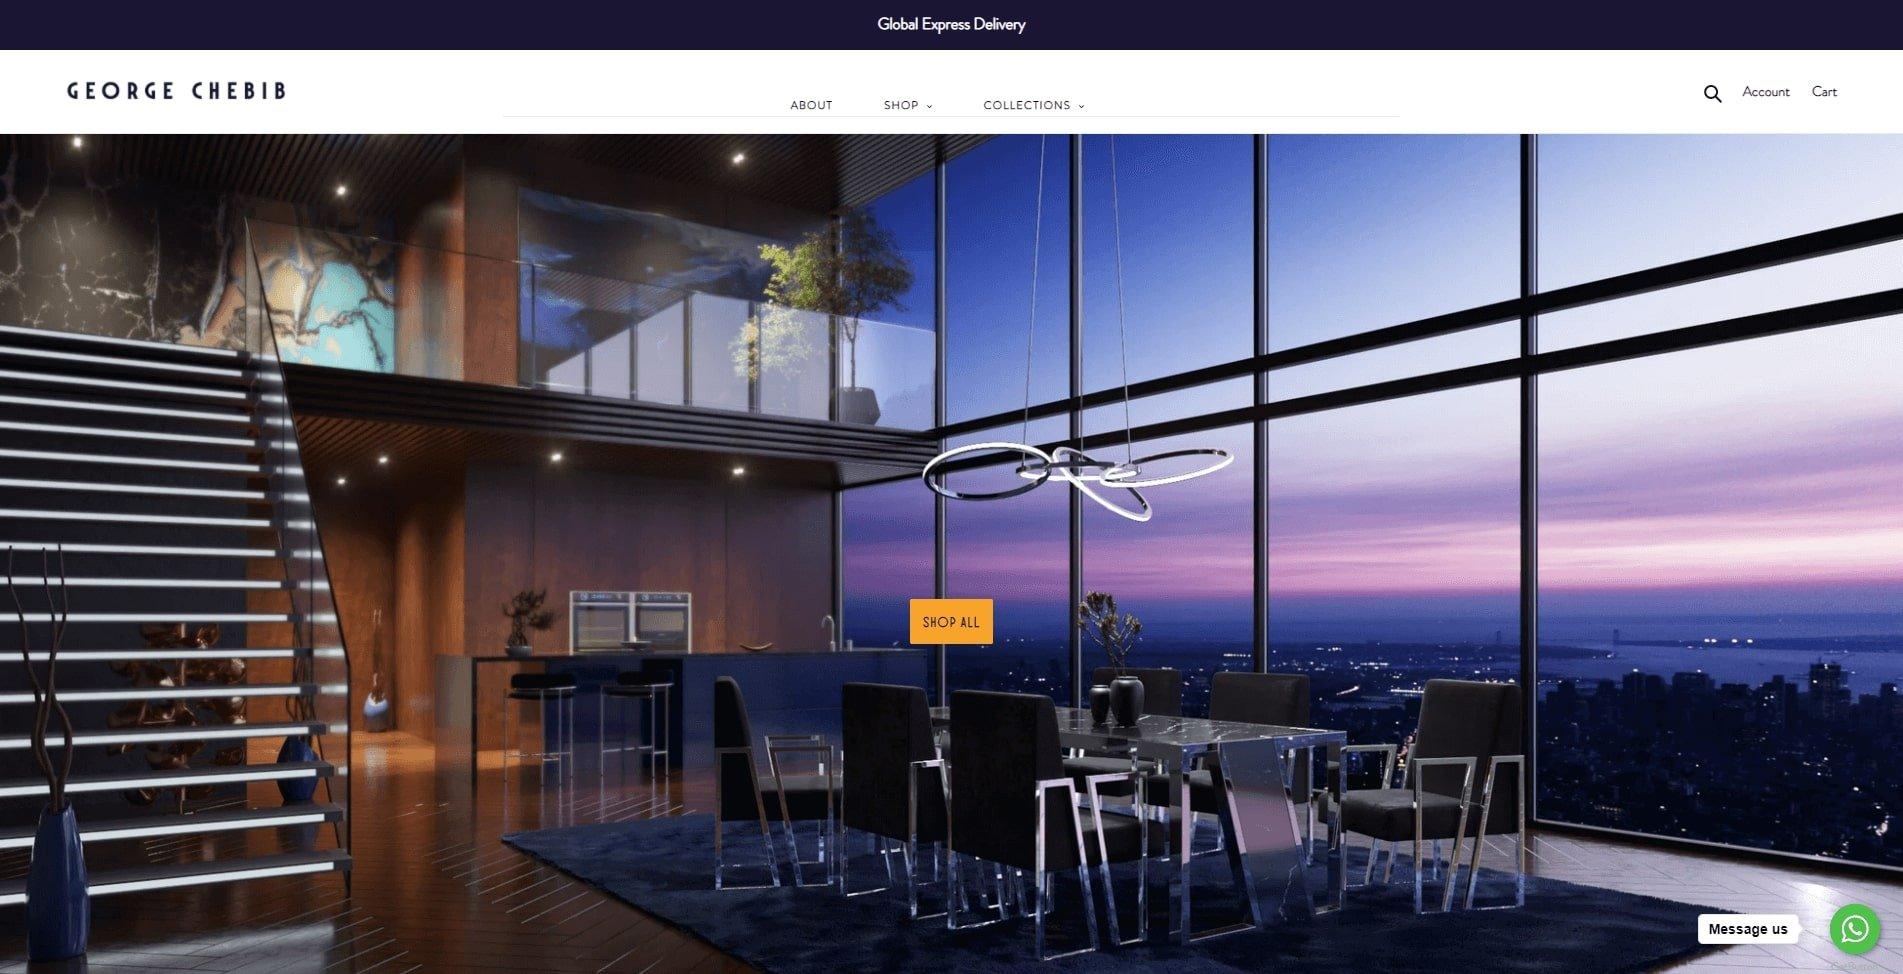 Furniture 3D Visualization in a Roomset on George Chebib Furniture Site